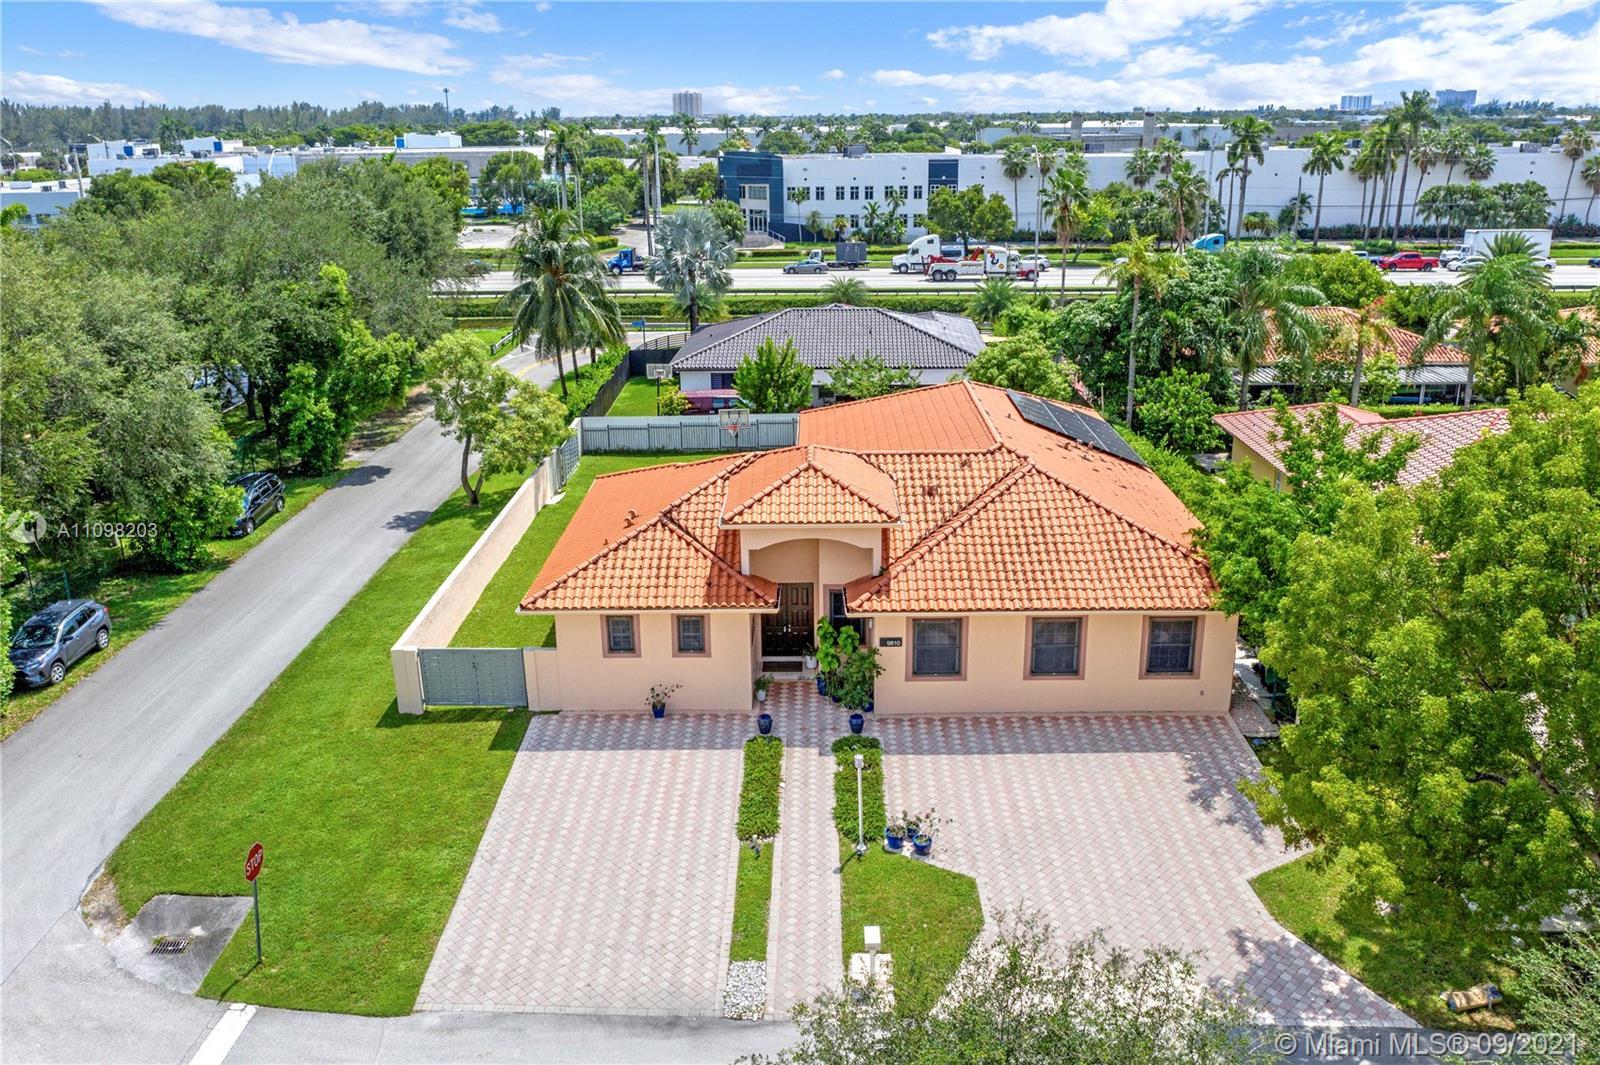 Las Ramblas - 9810 NW 26th St, Doral, FL 33172